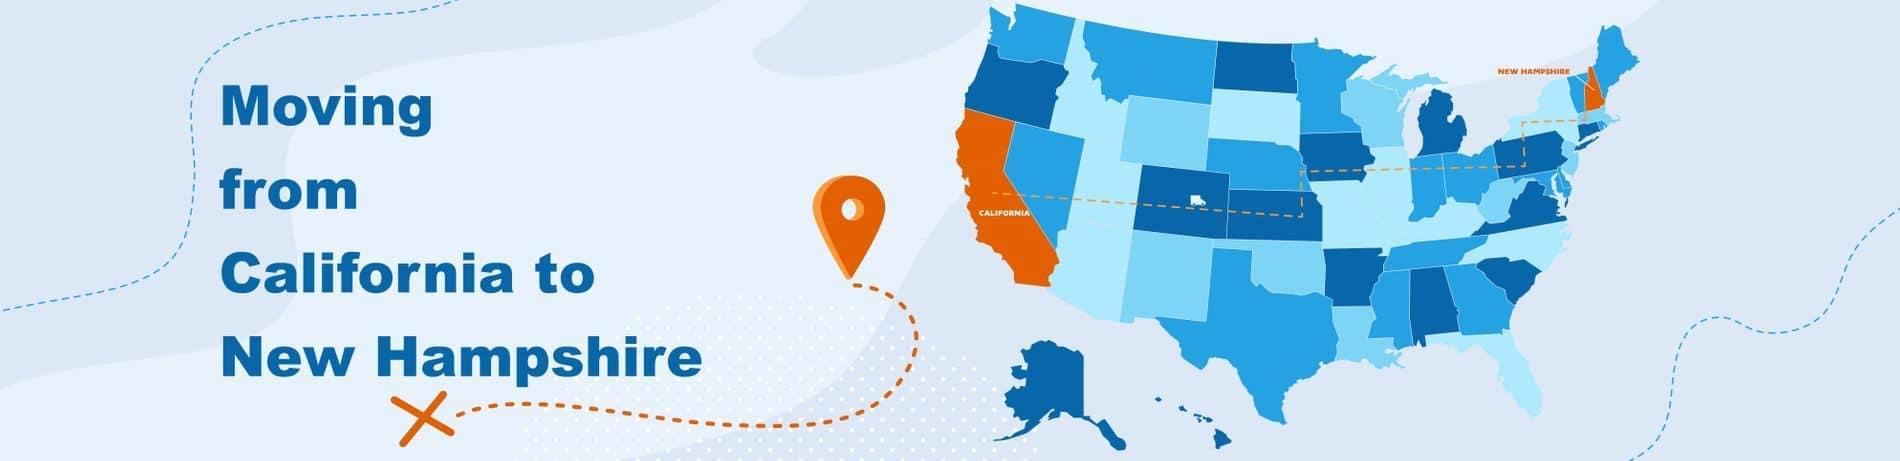 California to New Hampshire